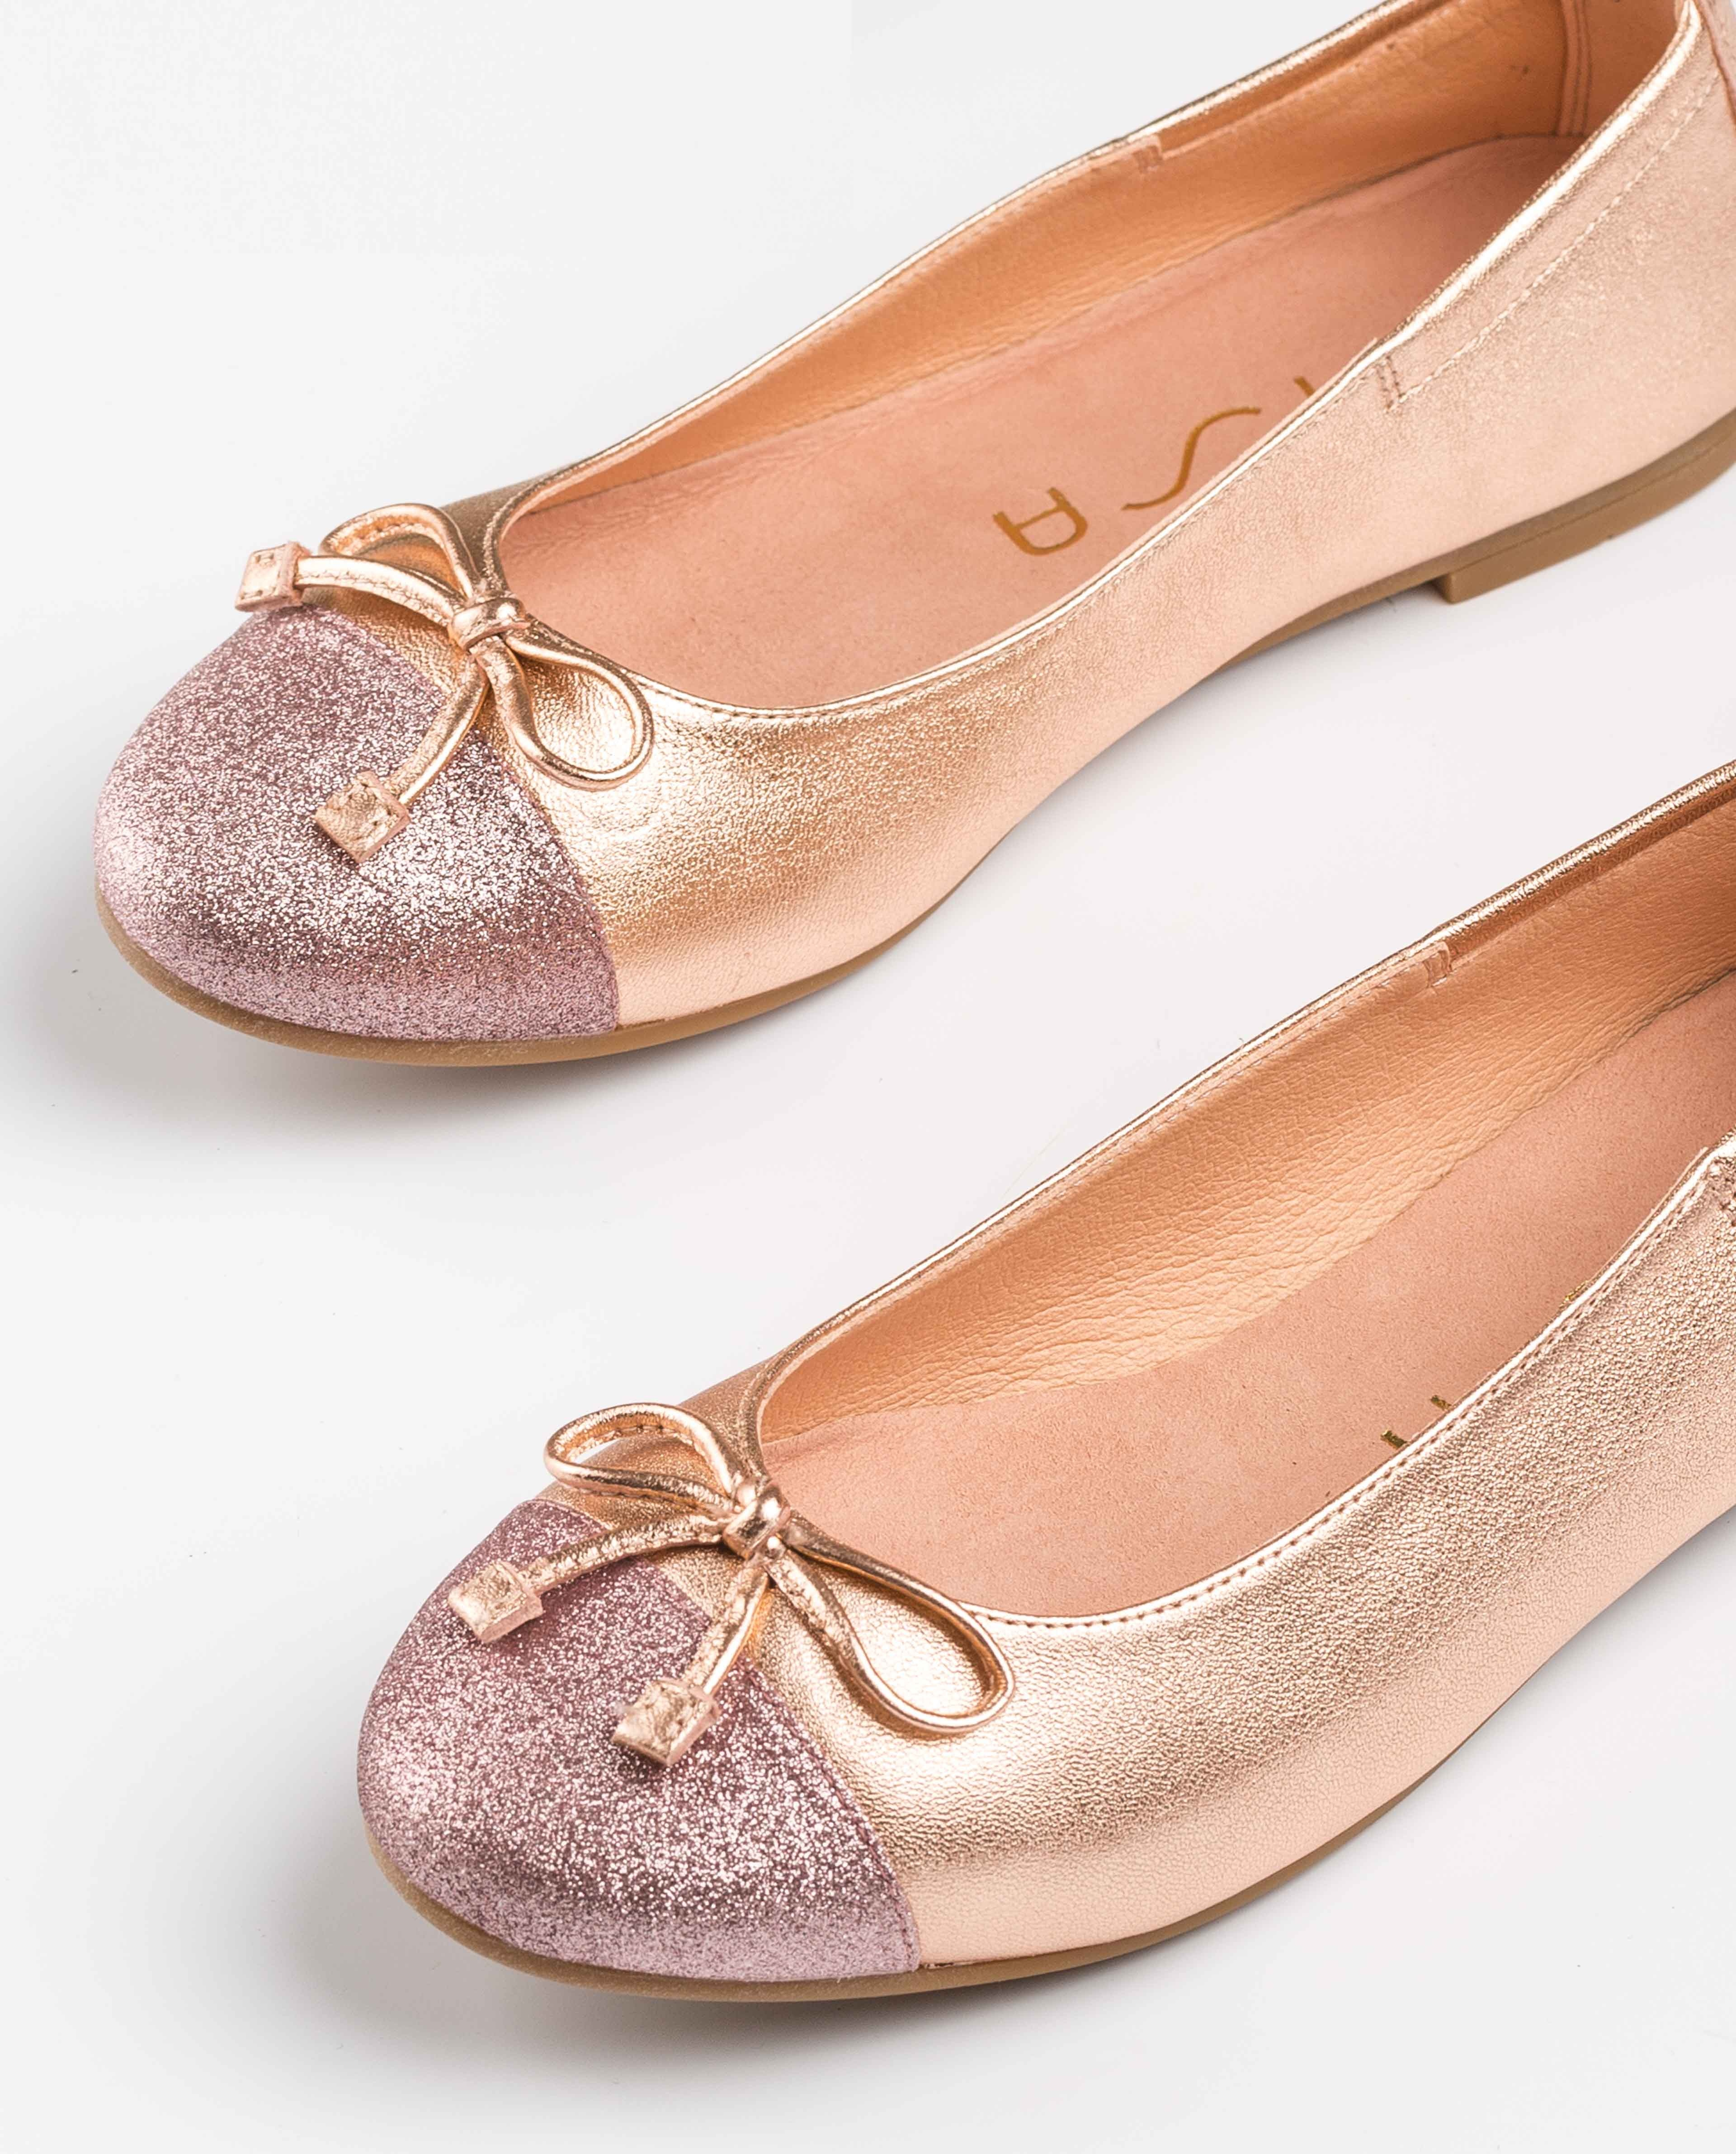 UNISA Contrast metal effect ballerinas for little girls DINO_20_LMT_SI ballet 2